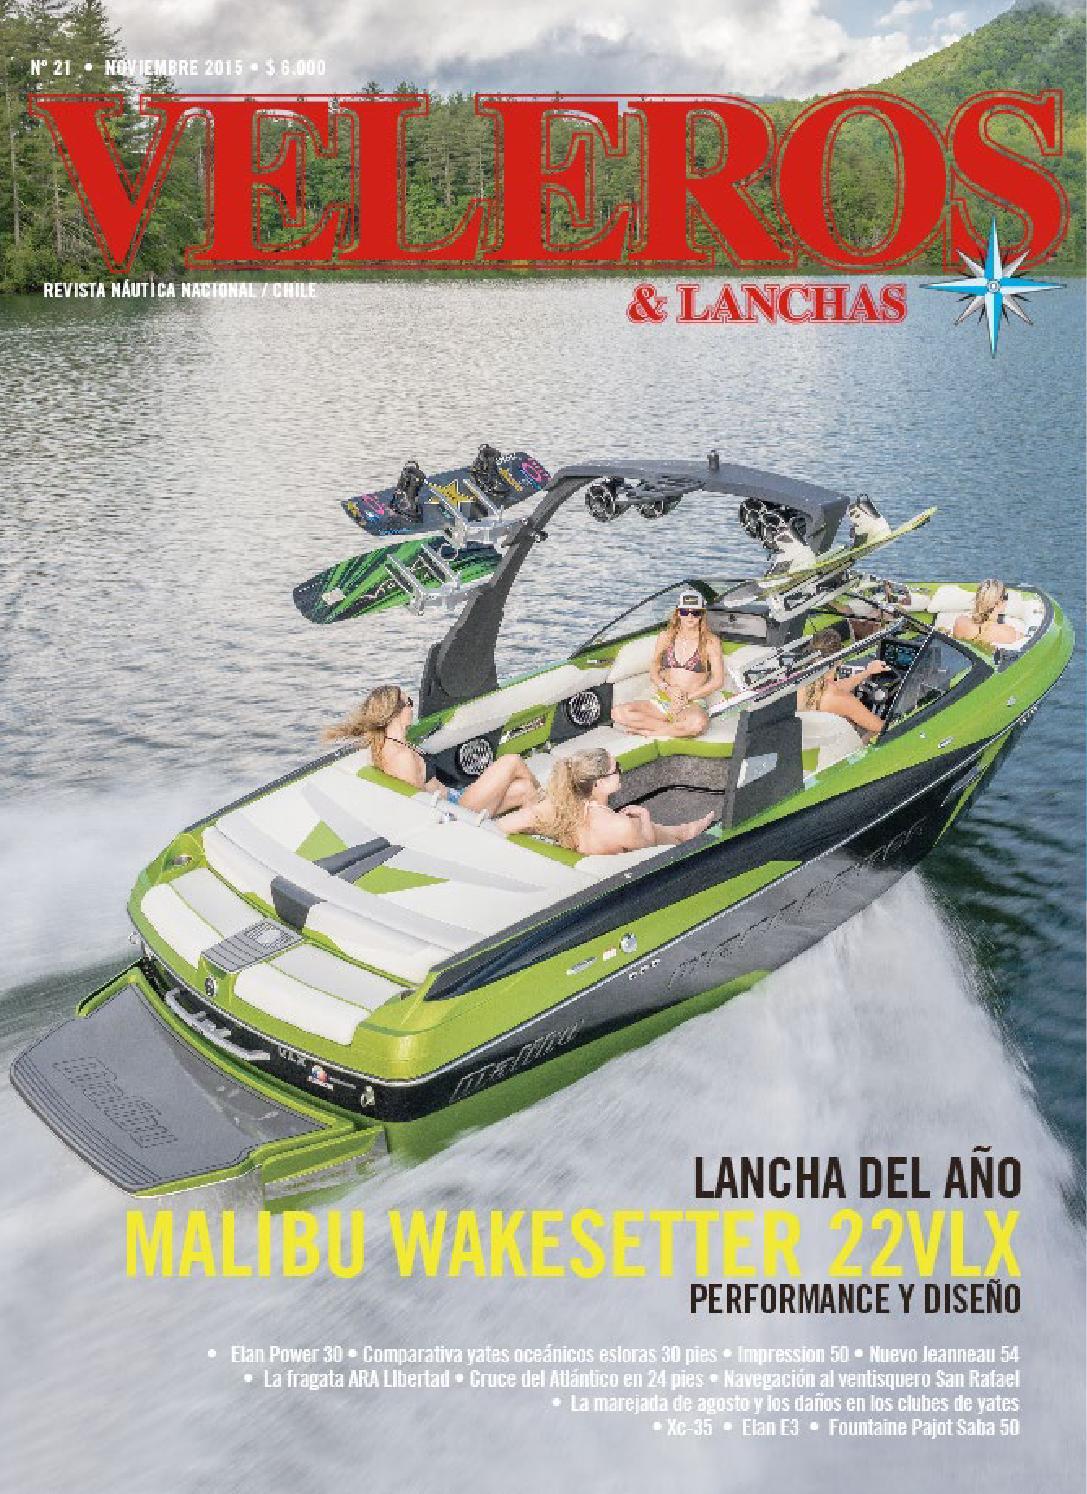 Revista Veleros #20 by Revista Veleros - issuu